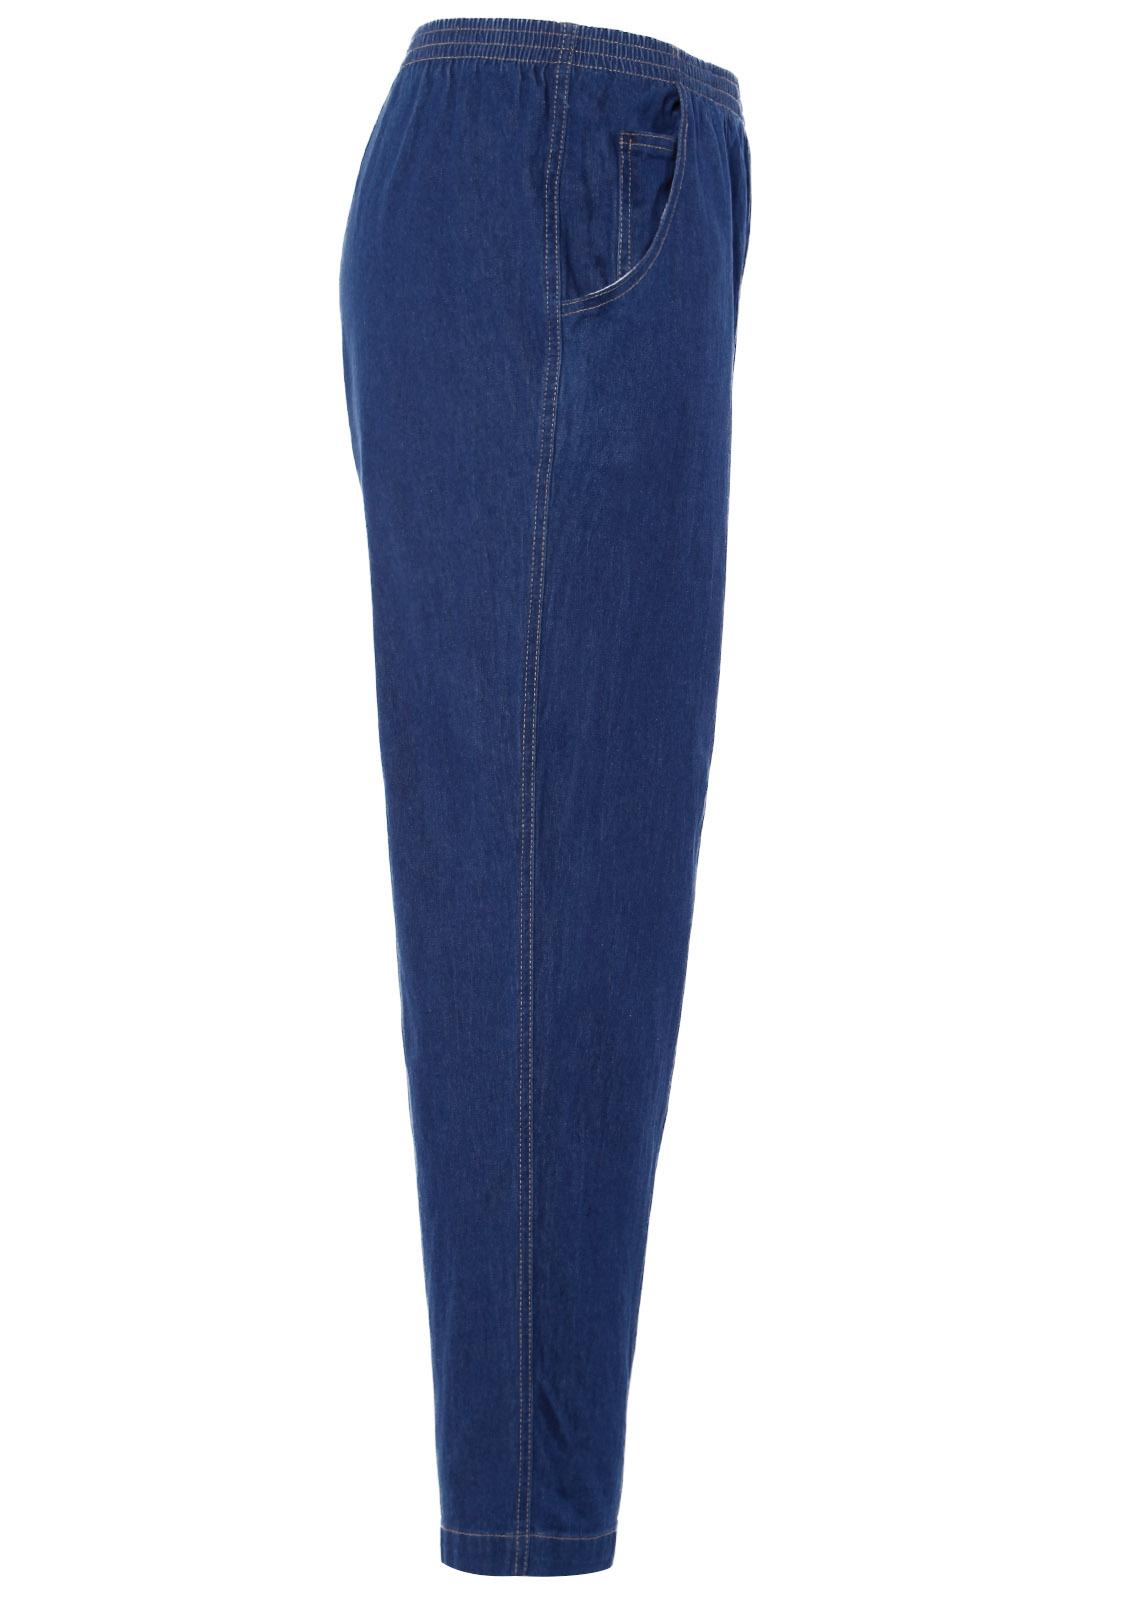 Wonderful Koret Womens Ladies High Waist Denim Elastic Waist Jeans Slim Fit Pant